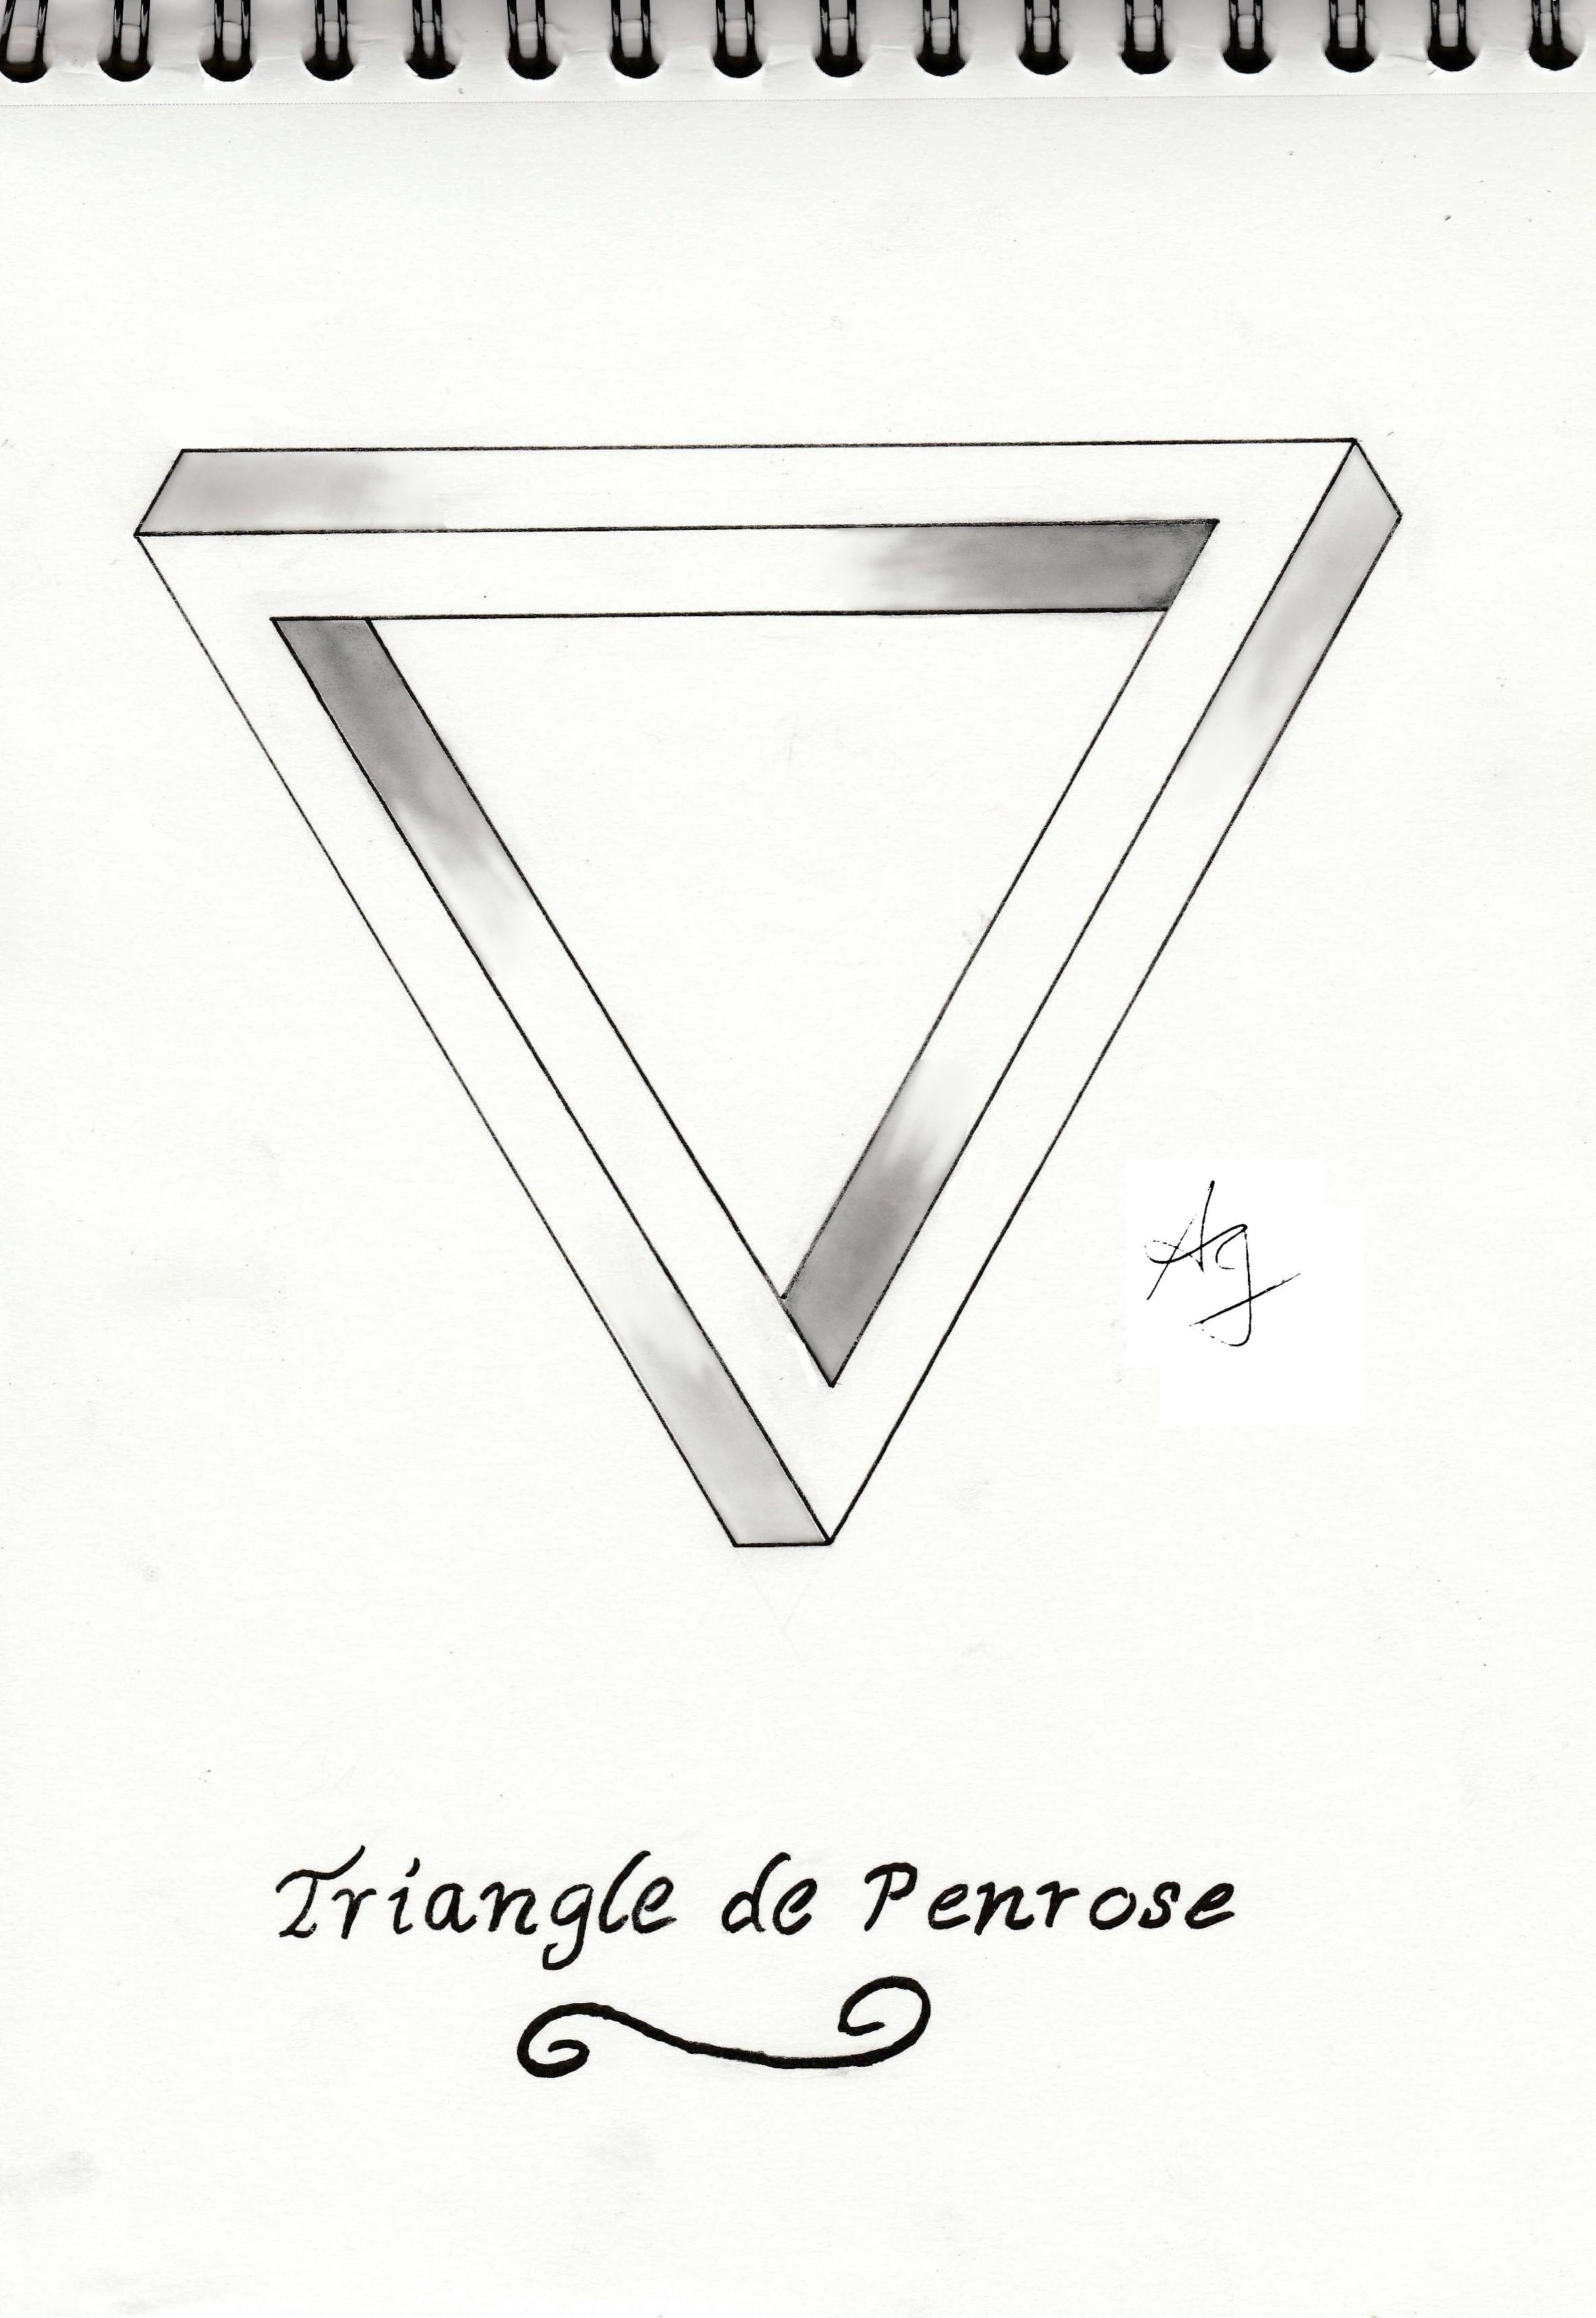 Illusion D Optique 1 Le Triangle De Penrose Aliengirl Art